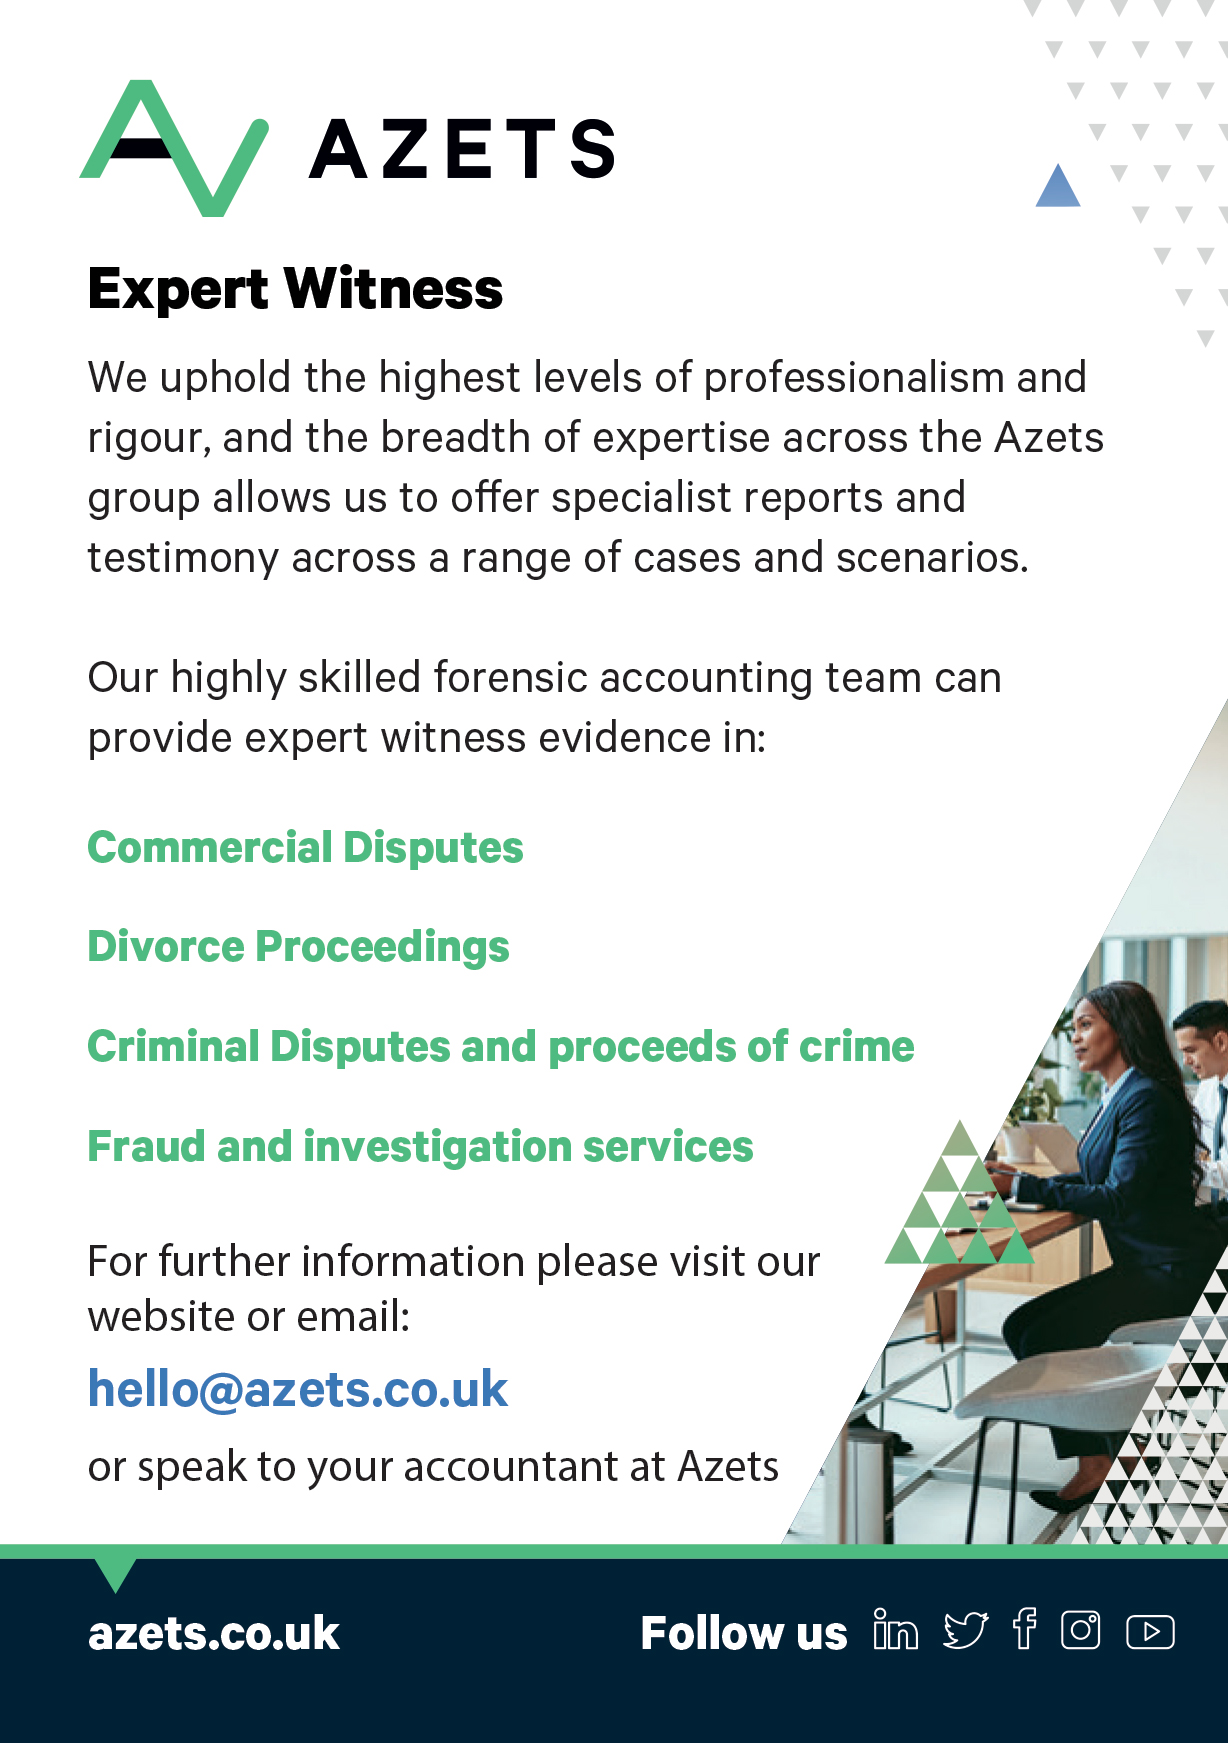 azets-expert-witness-ad